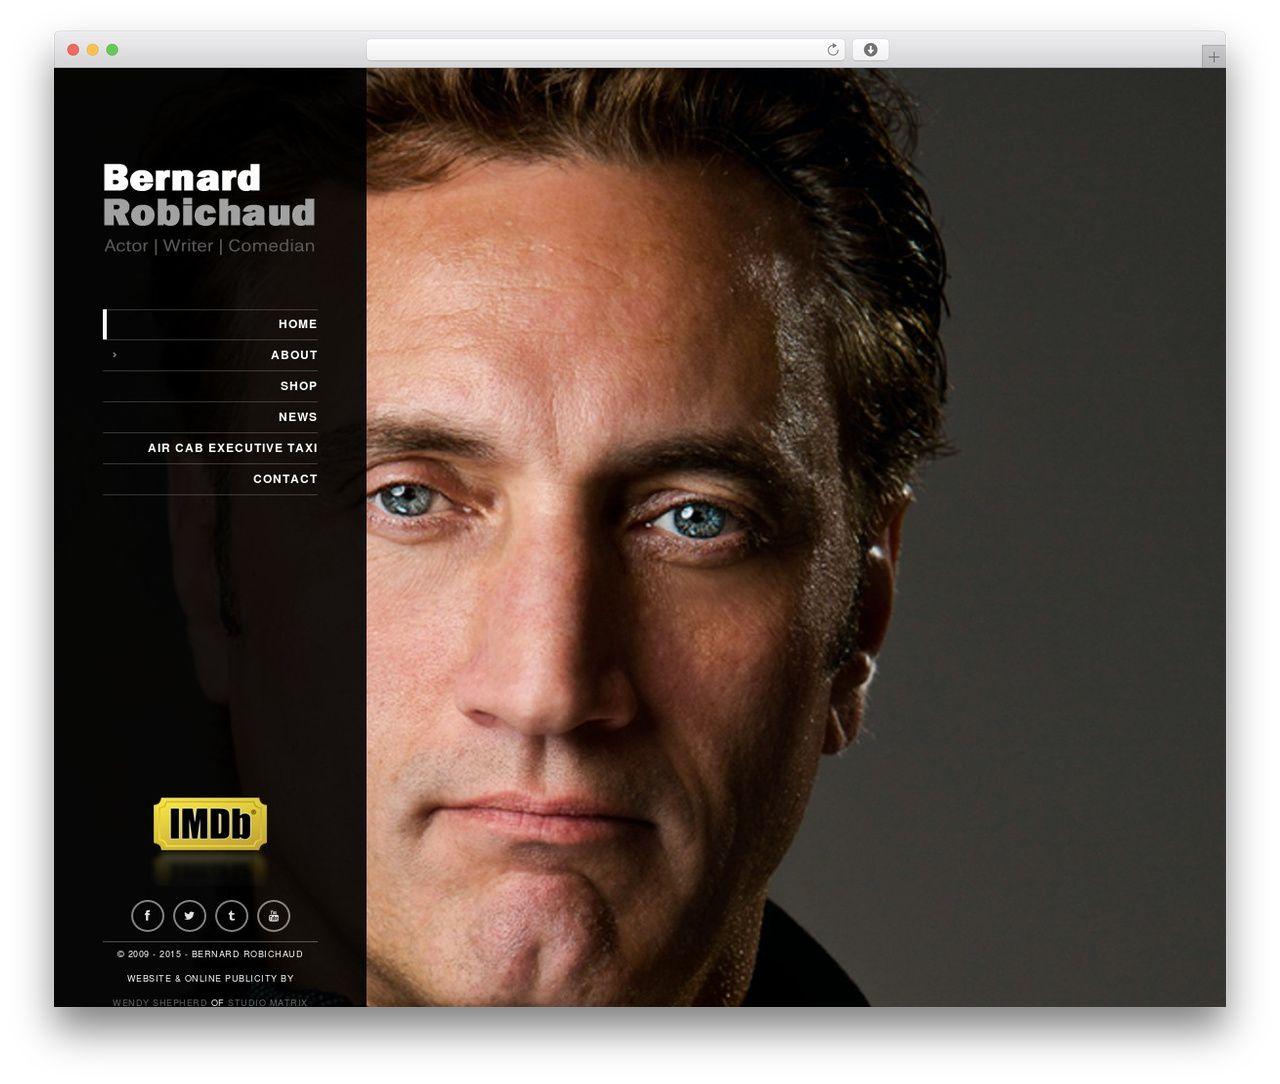 Photo Reactive Fullscreen For Wordpress Wordpress Website Template